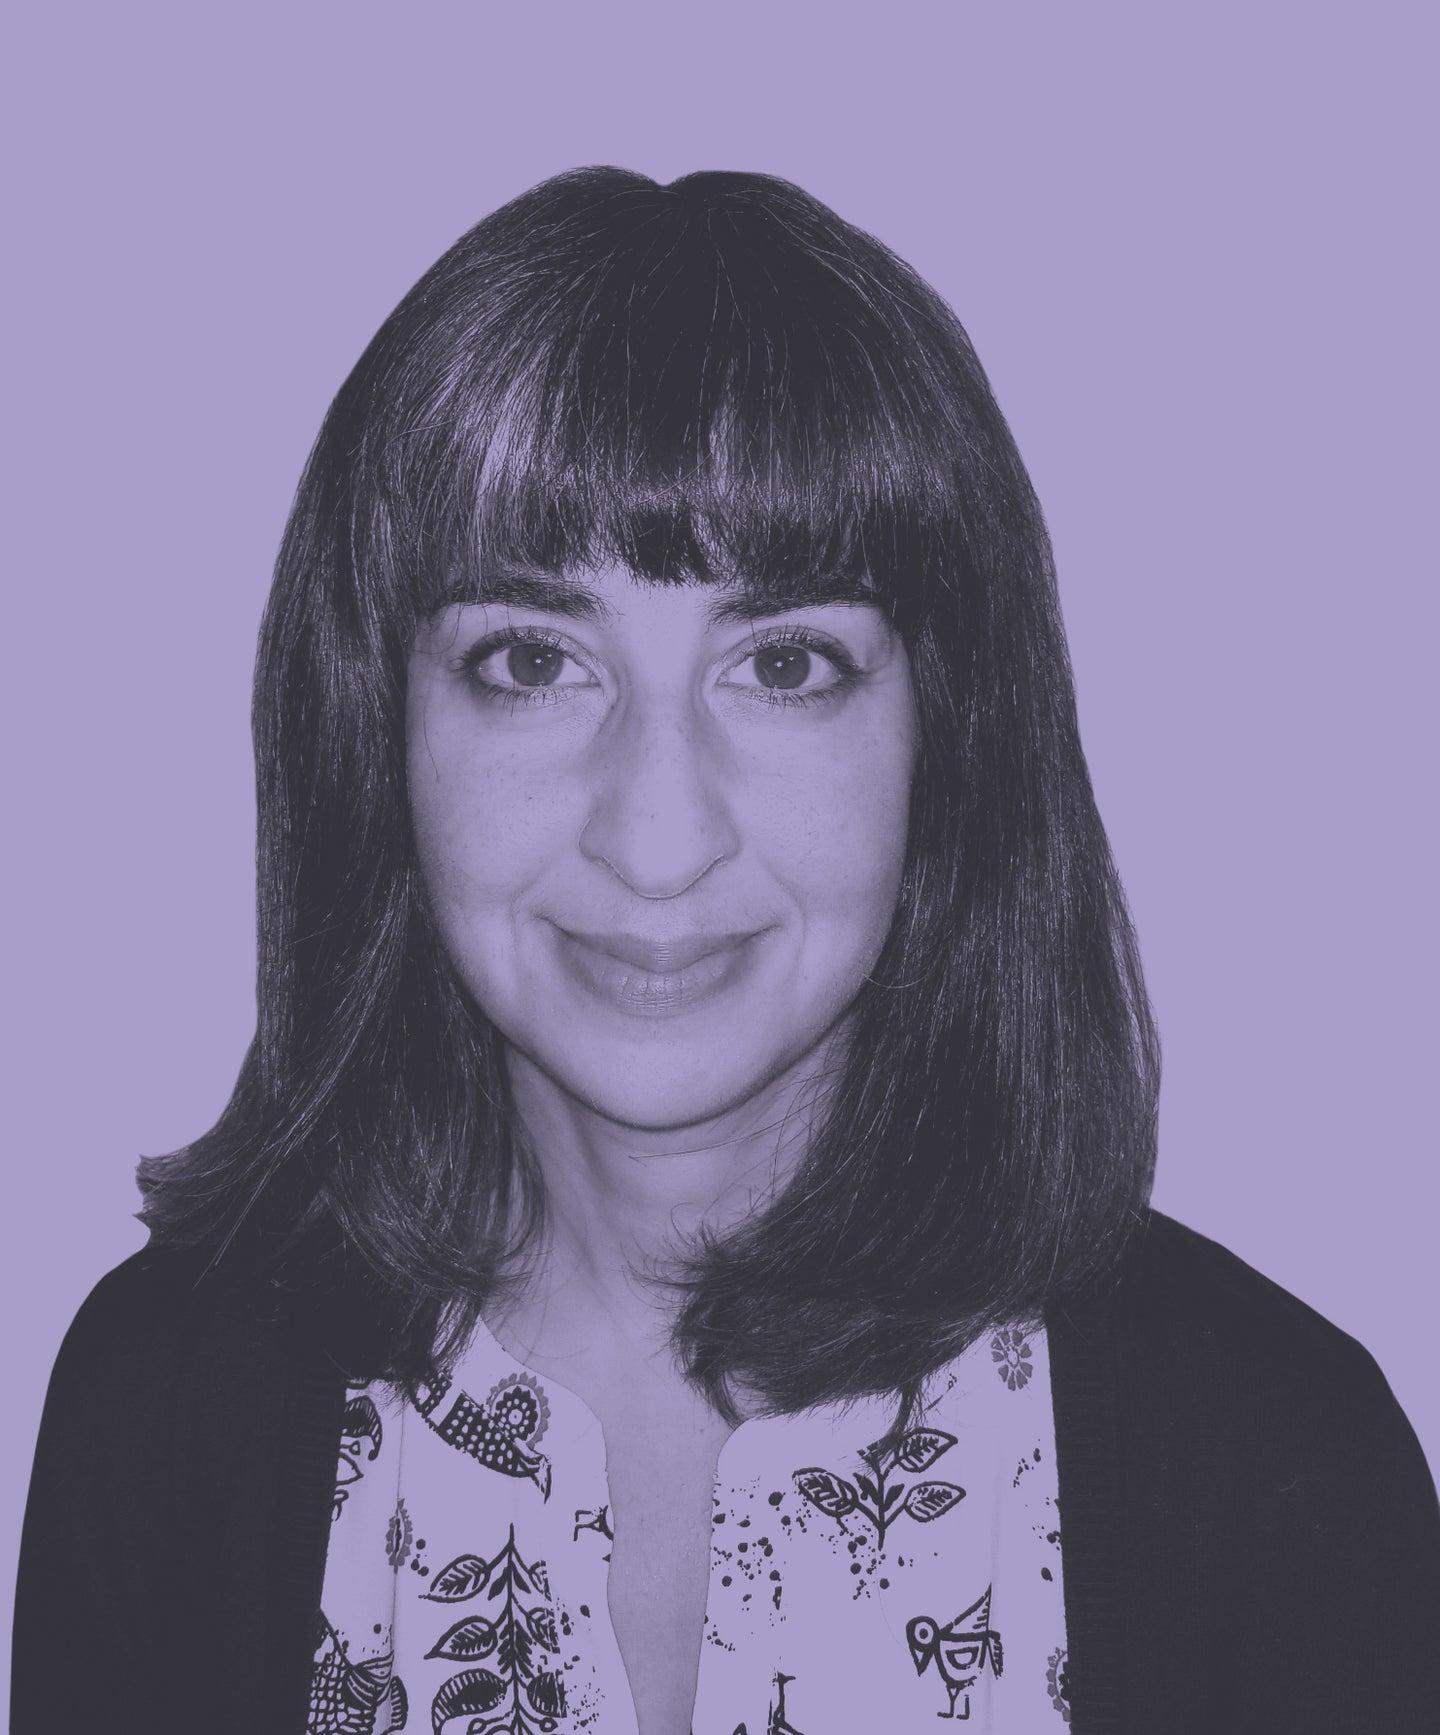 Sarah Theodoroff on a purple background